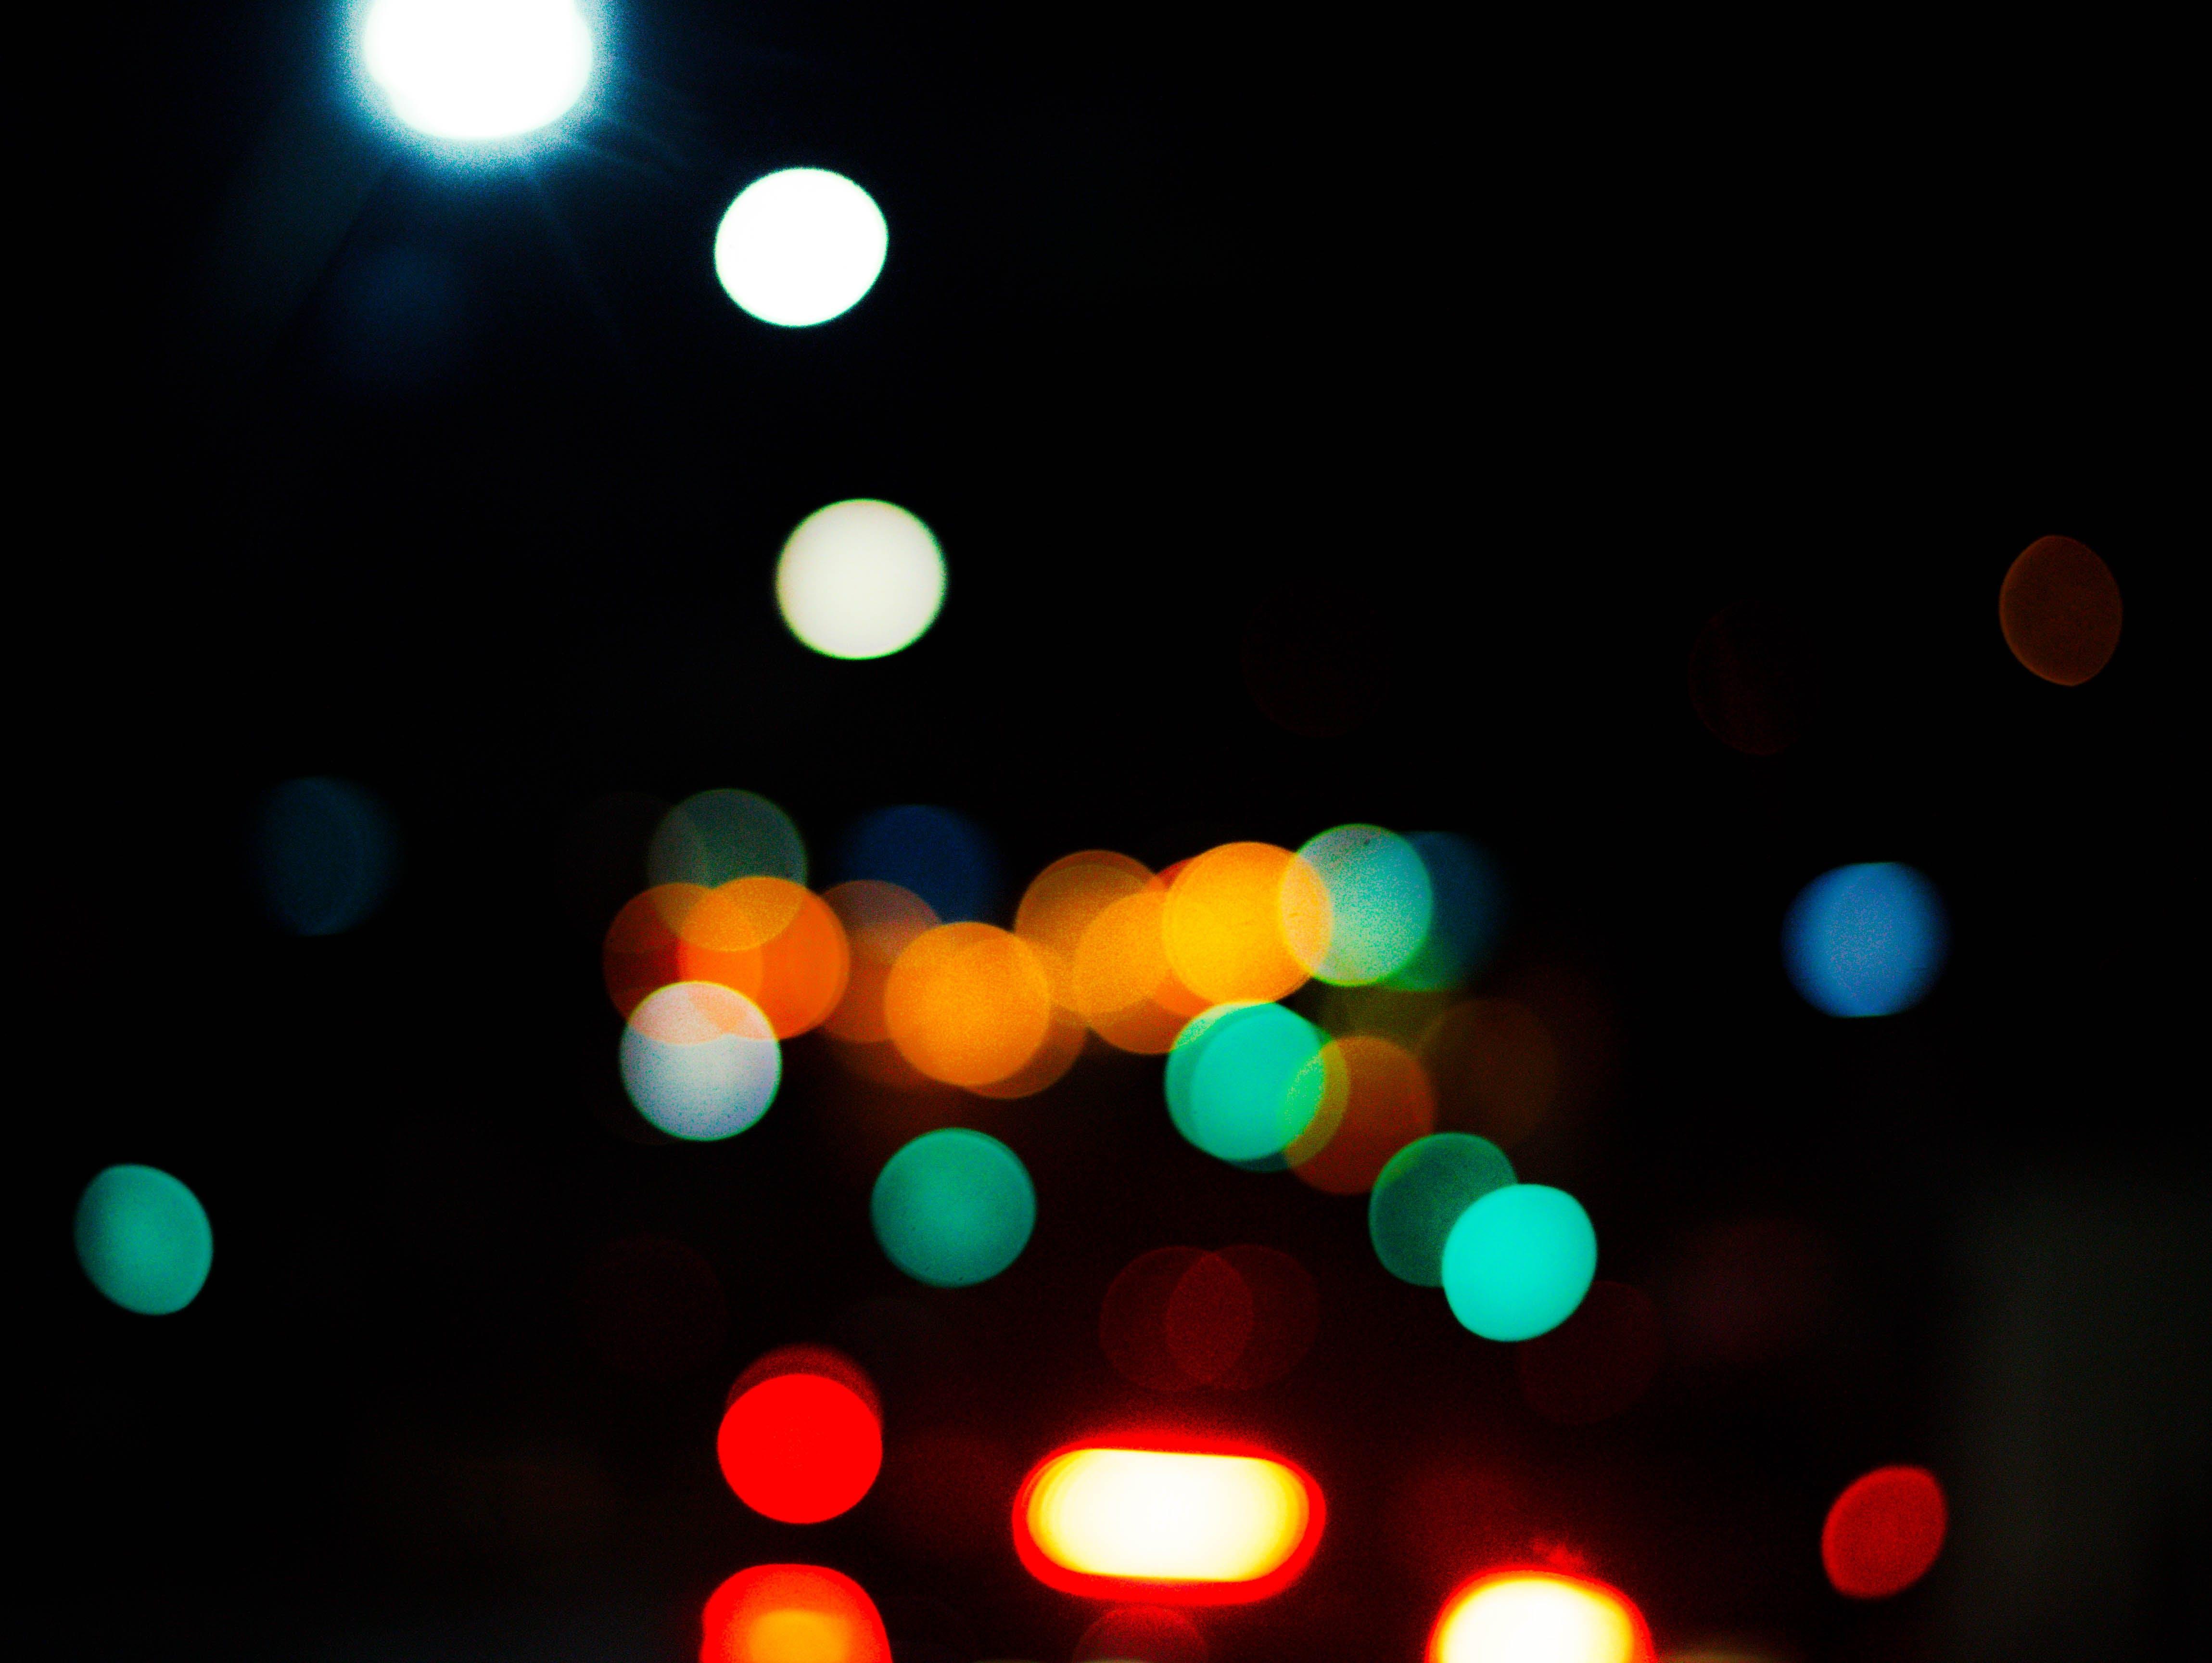 Turned-on Bokeh Lights